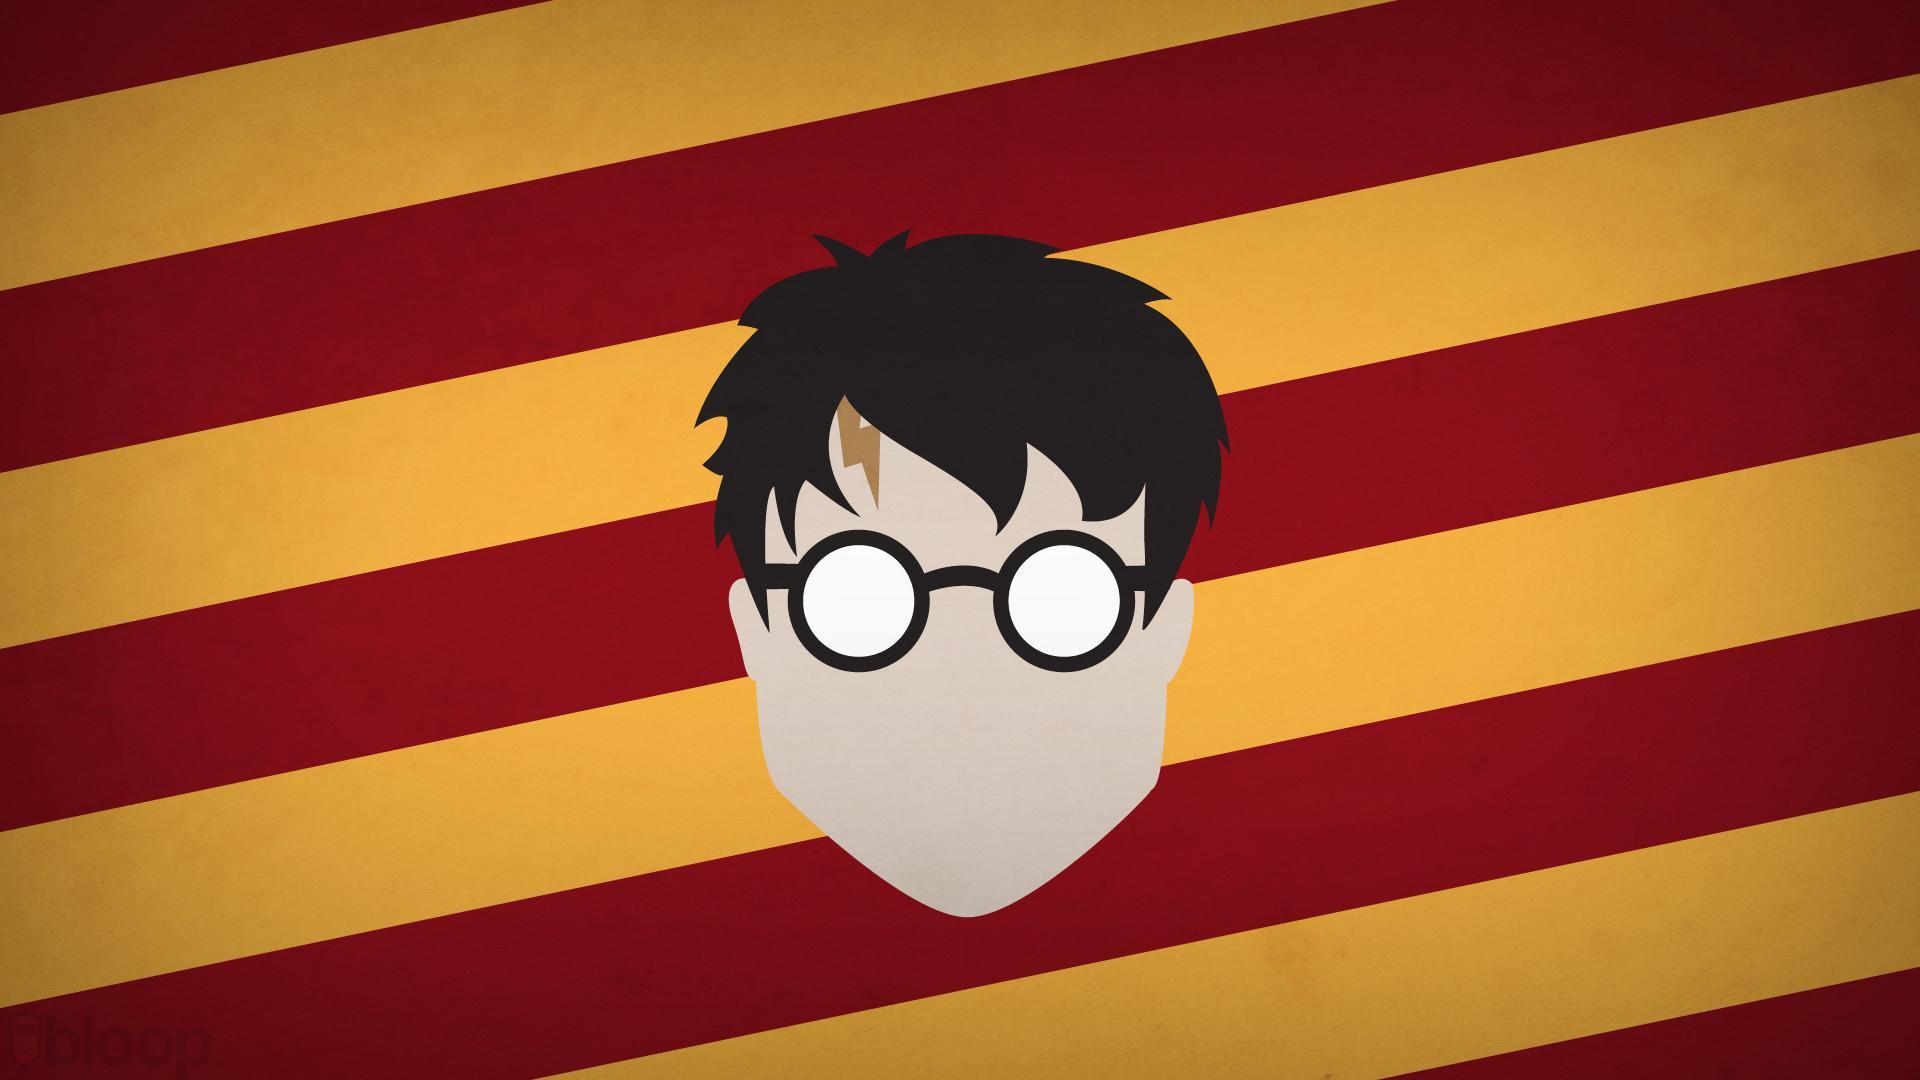 Harry Potter Wallpaper HD Download